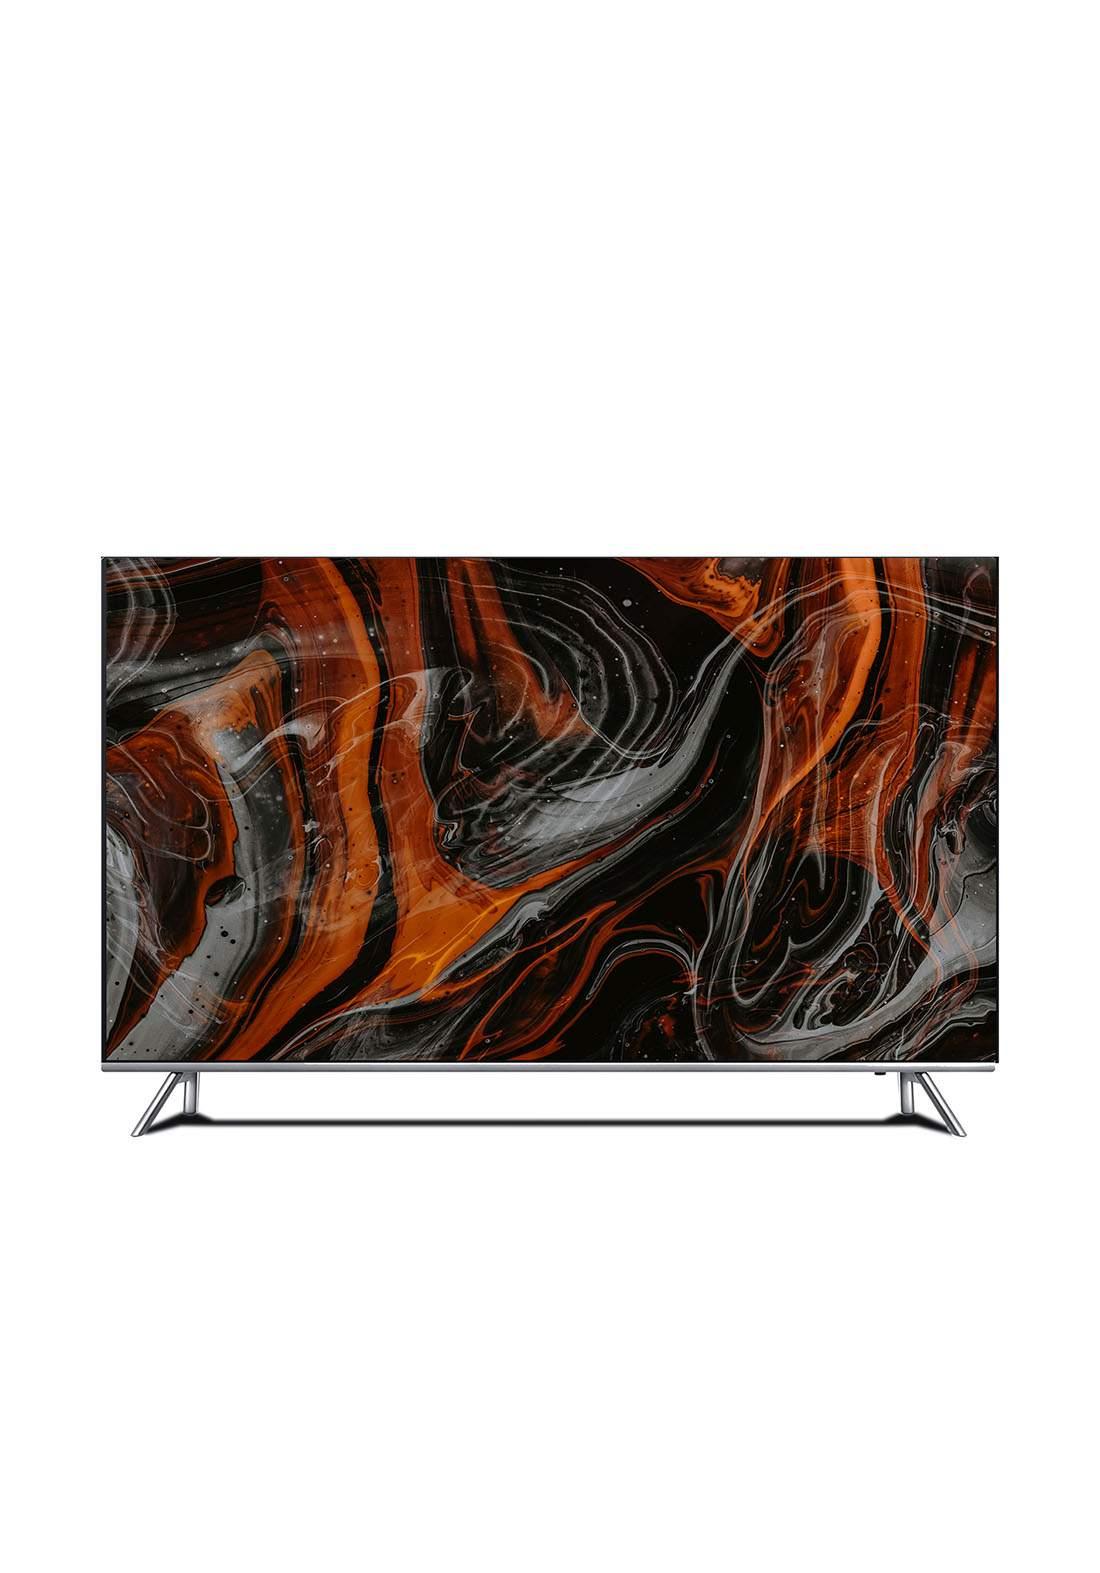 Shark Smart Led Tv - 43inch شاشة ذكية